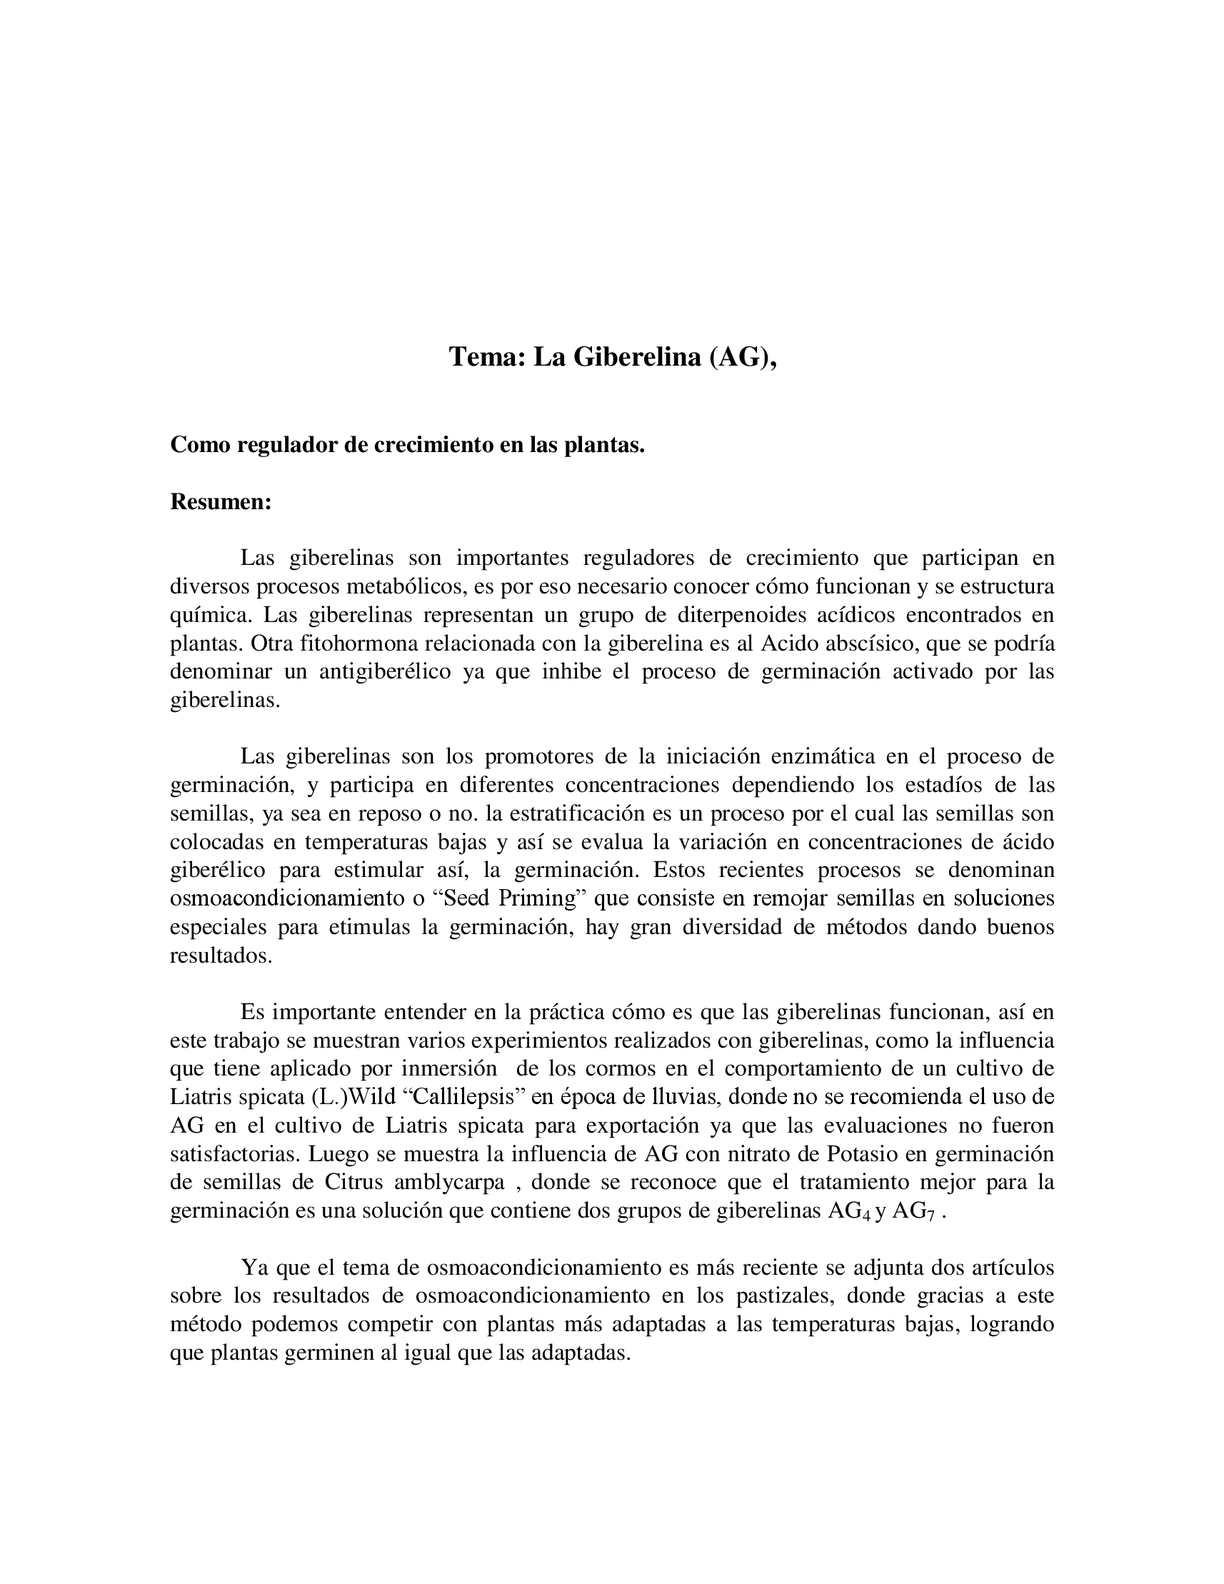 Calaméo - La Giberelina (Ag)